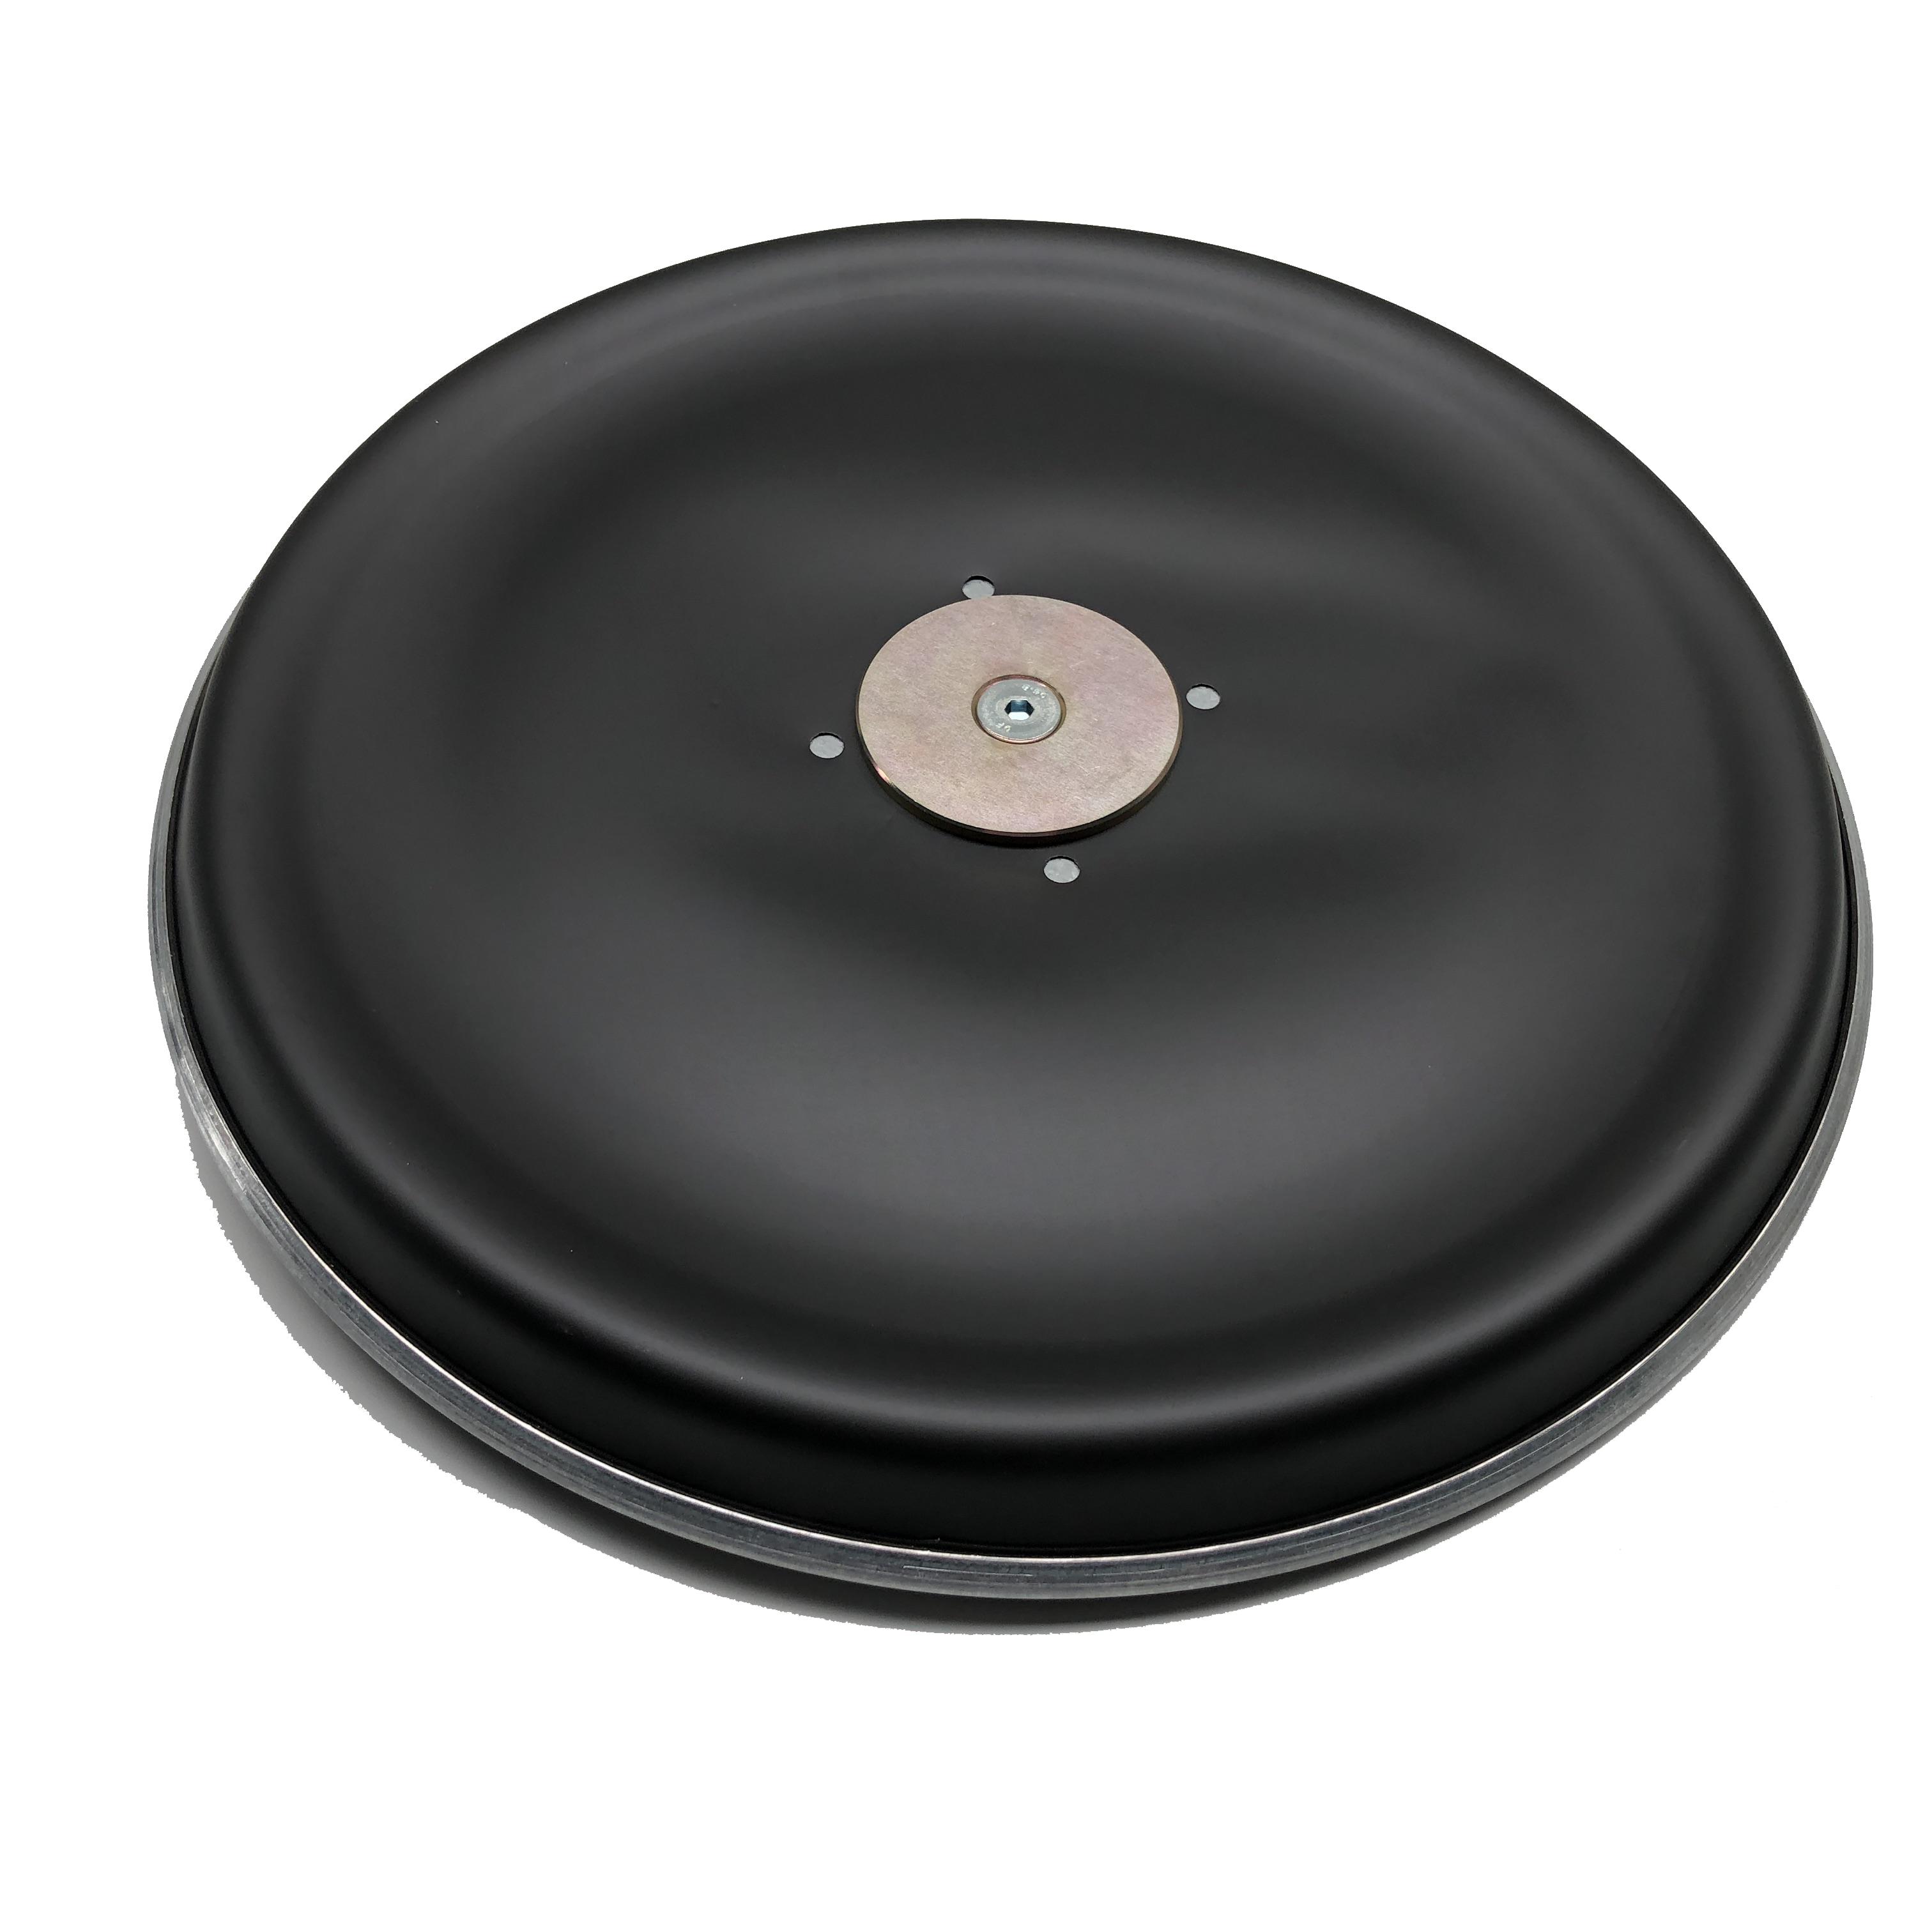 Aerofilm systems producten Polyurethane Caster